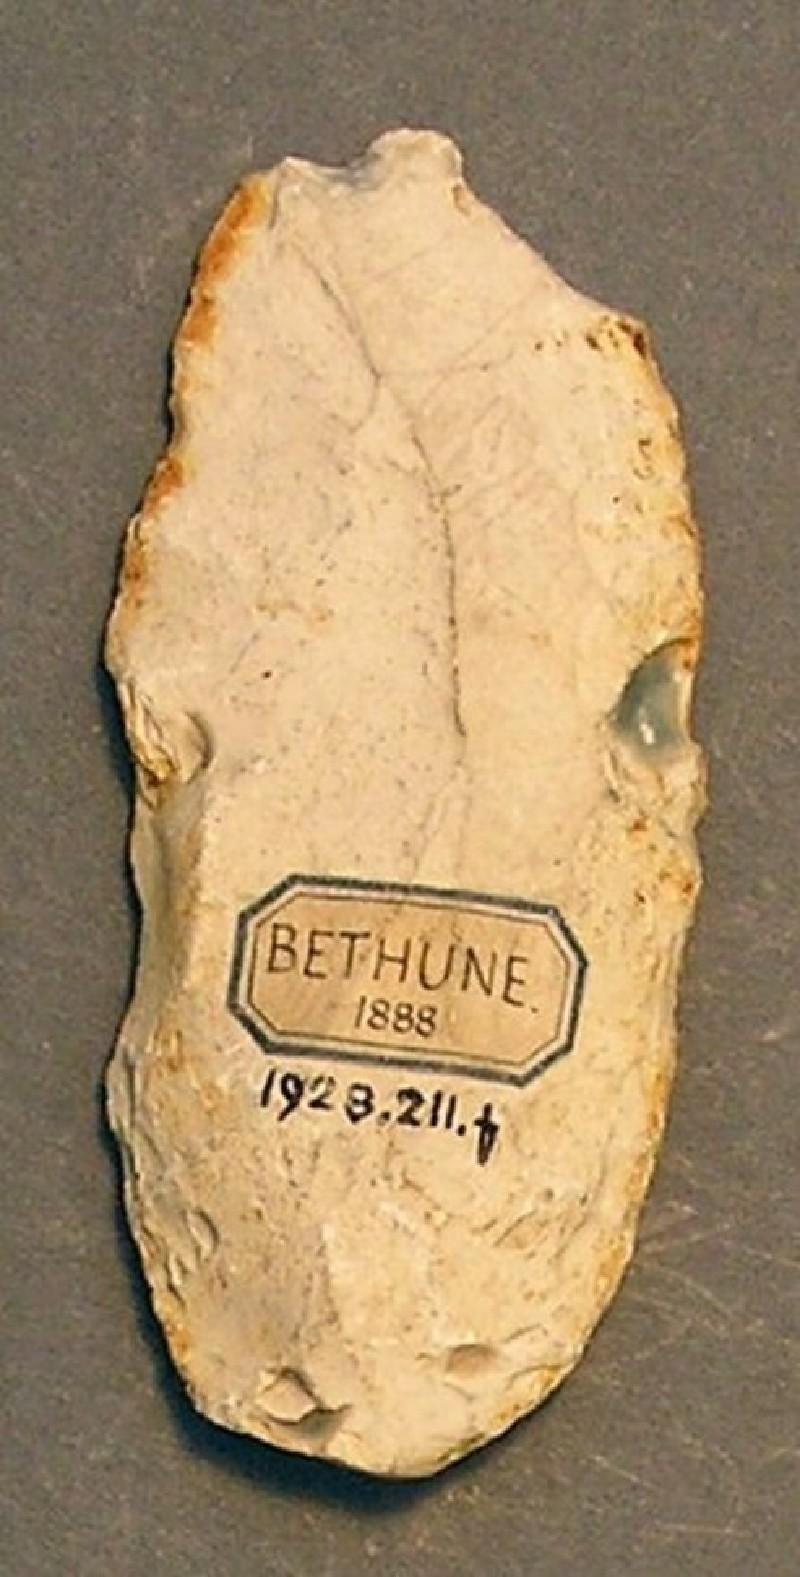 (AN1928.211.f, record shot)